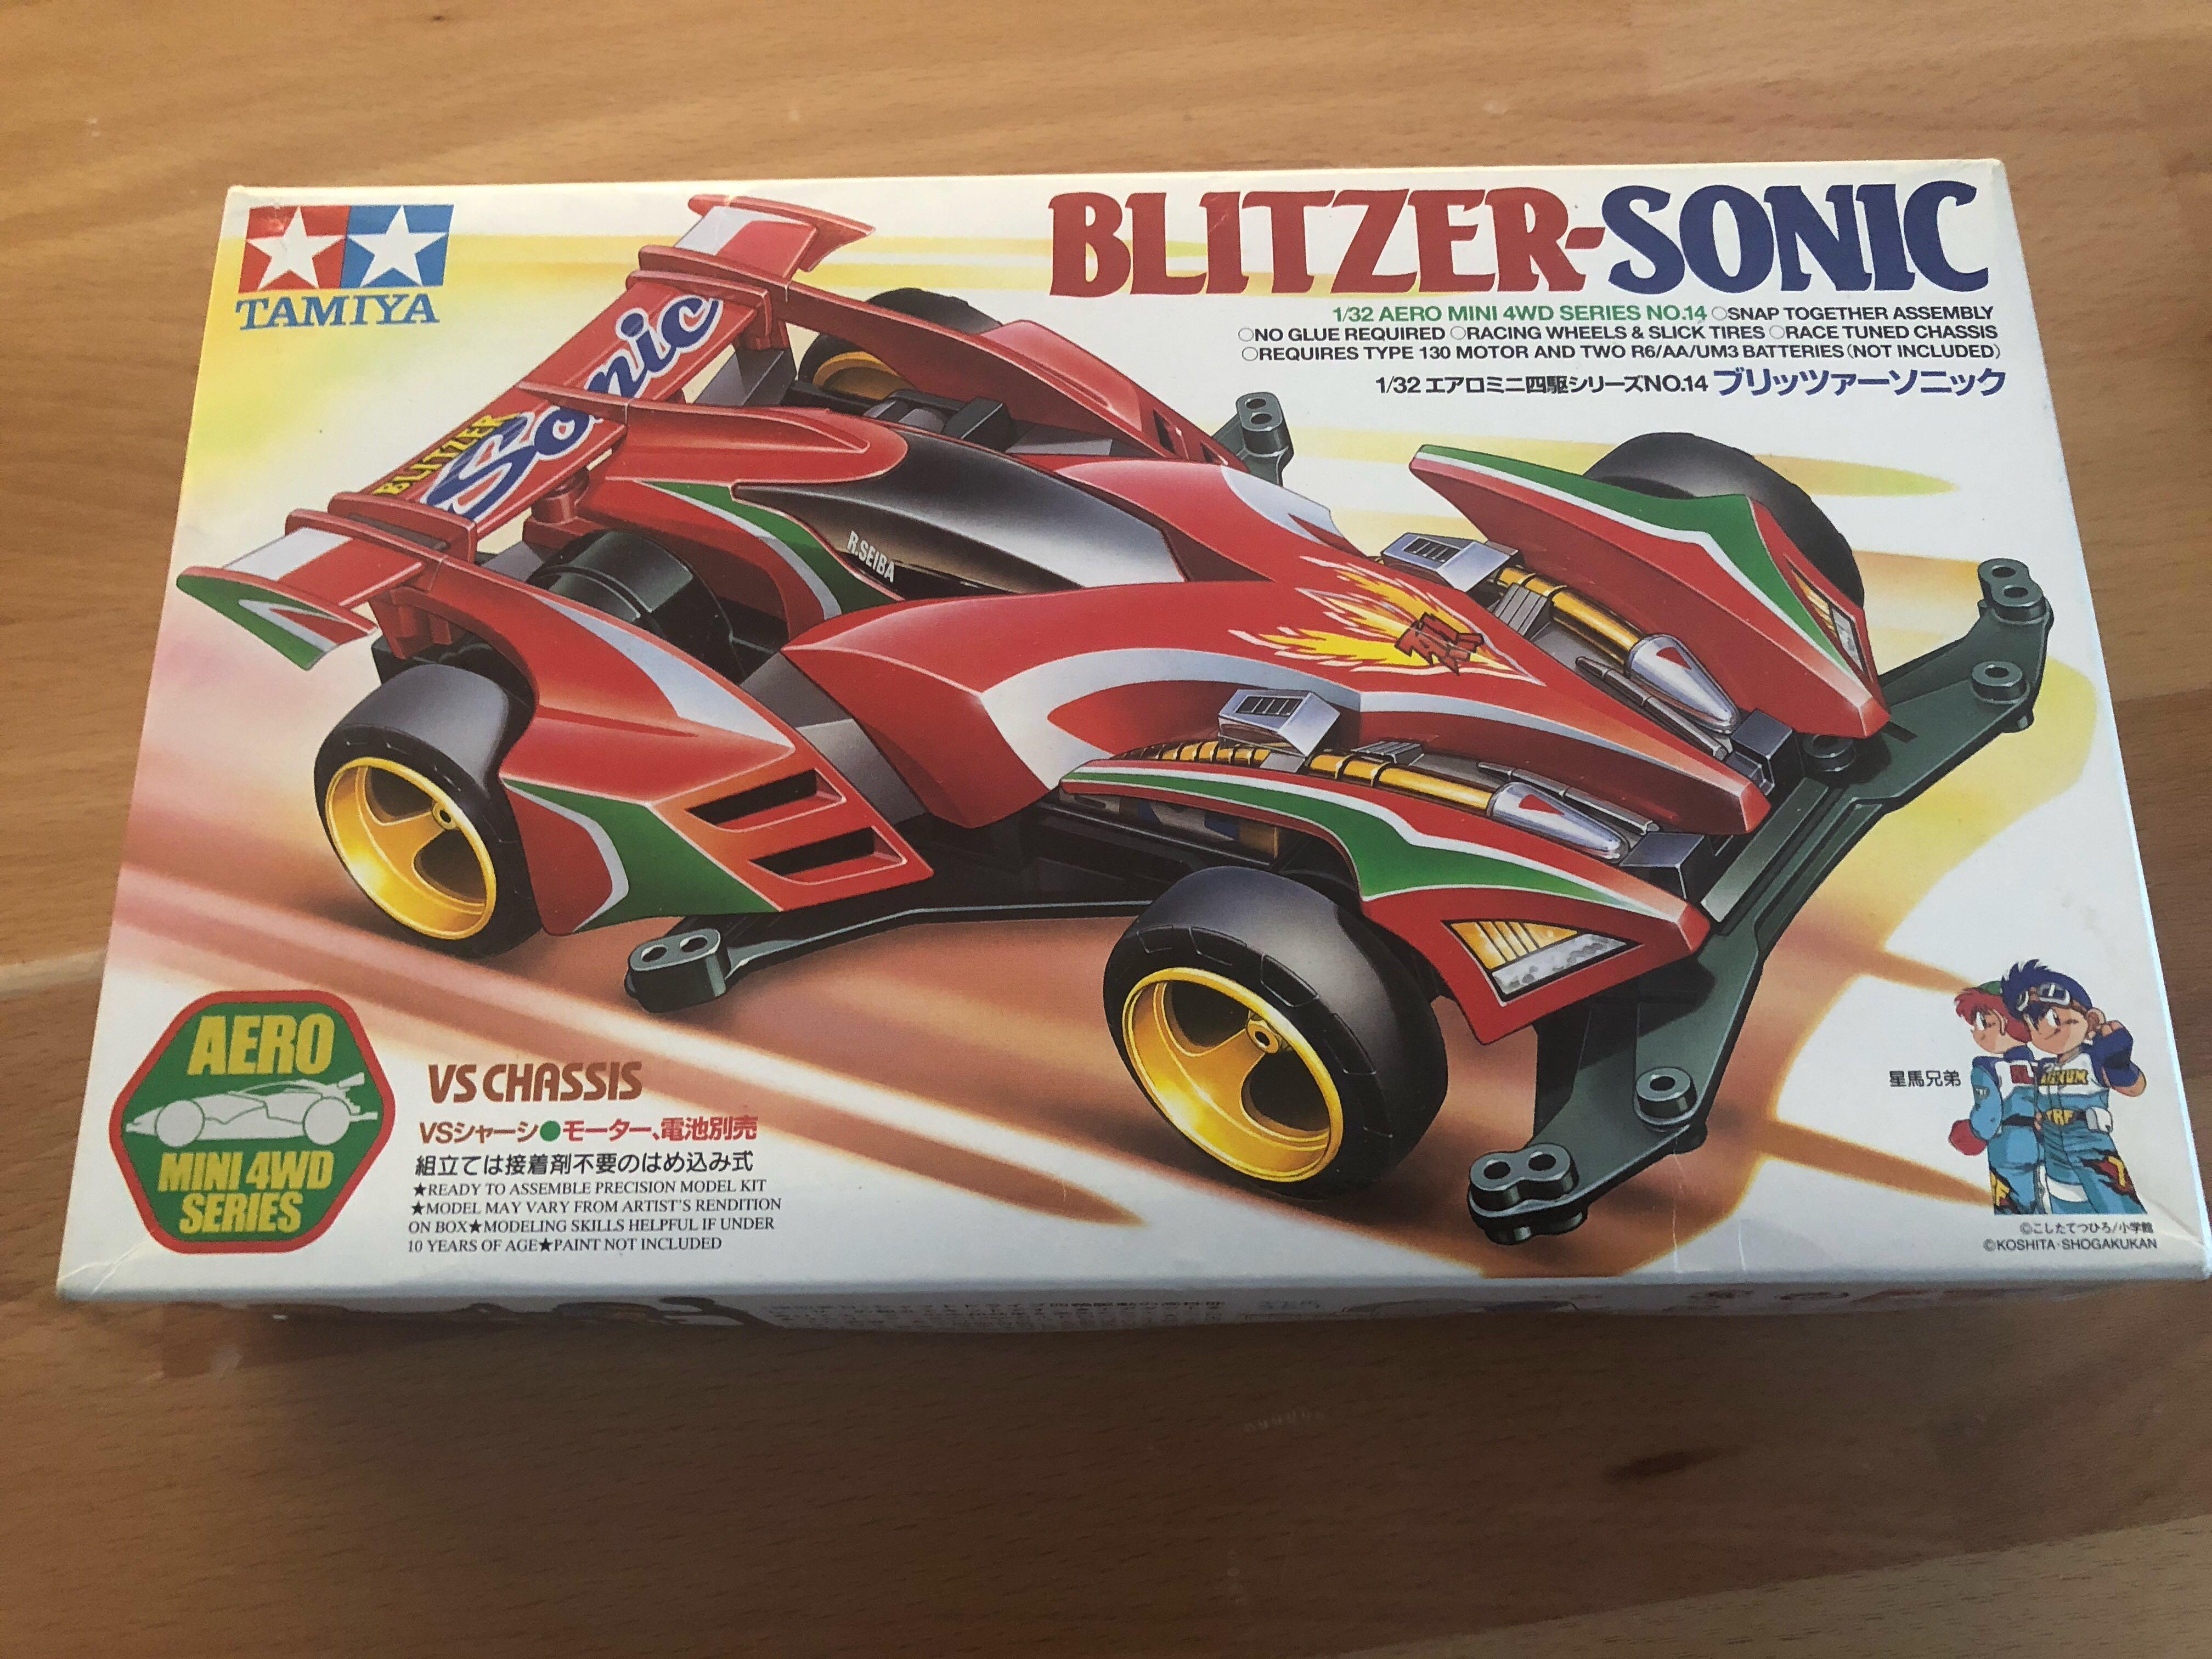 Tamiya Blitzer-Sonic 1/32 Aero Mini 4WD series no.14